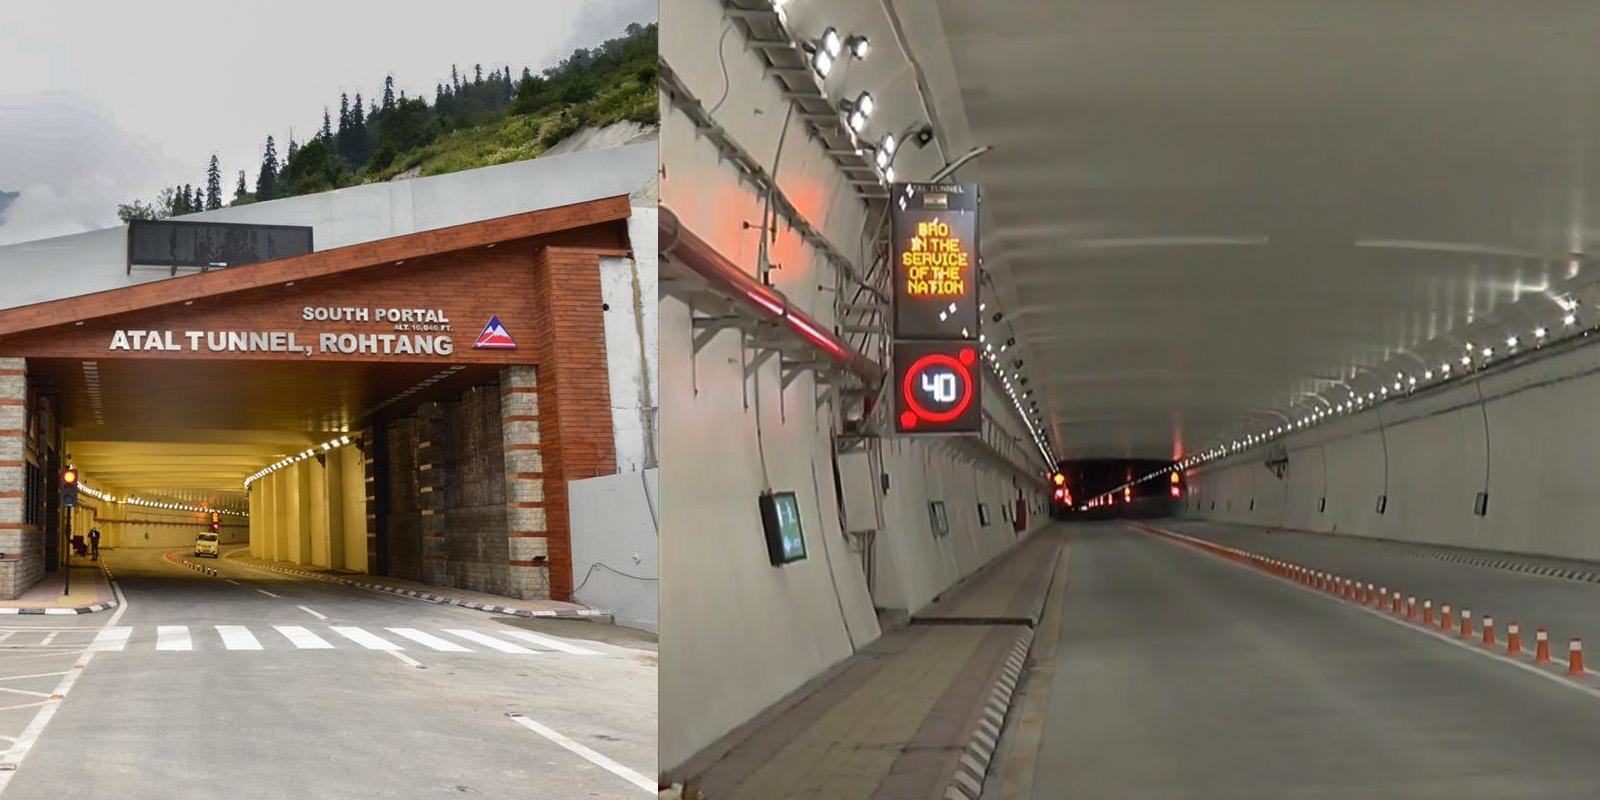 atal tunnel photos